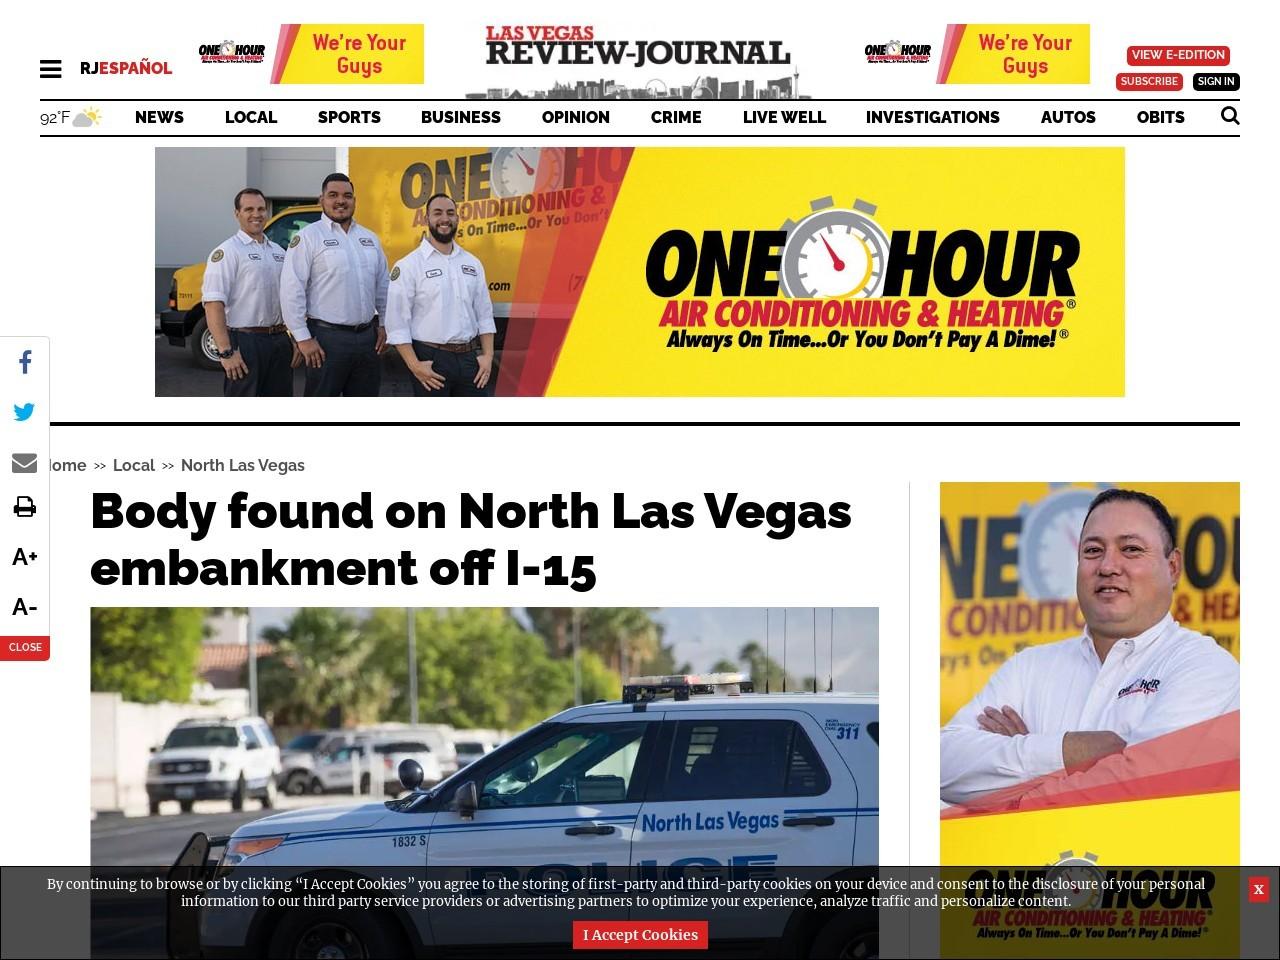 Body found on North Las Vegas embankment off I-15